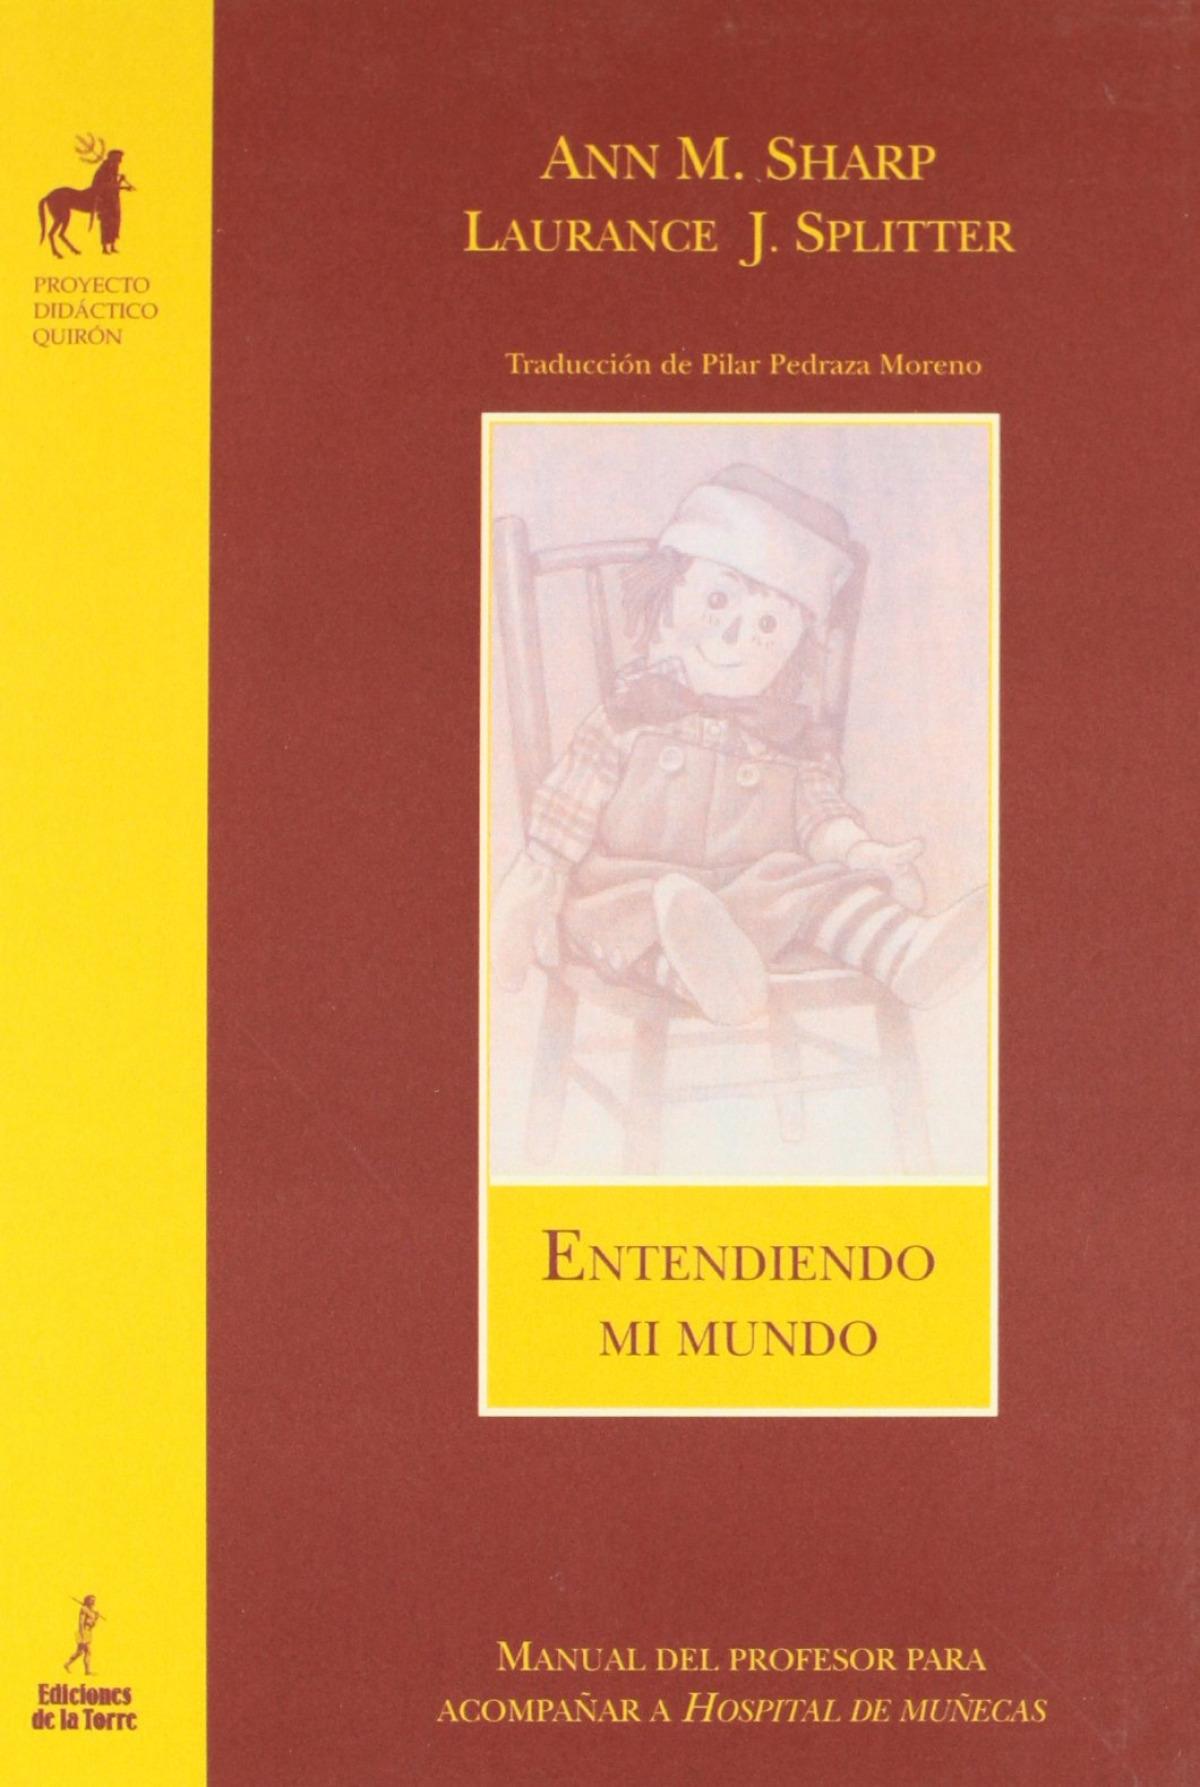 Entendiendo Mi Mundo (M.Profesor Hospital Muñecas) - Sharp, Ann M./Splitter, Laurence J.